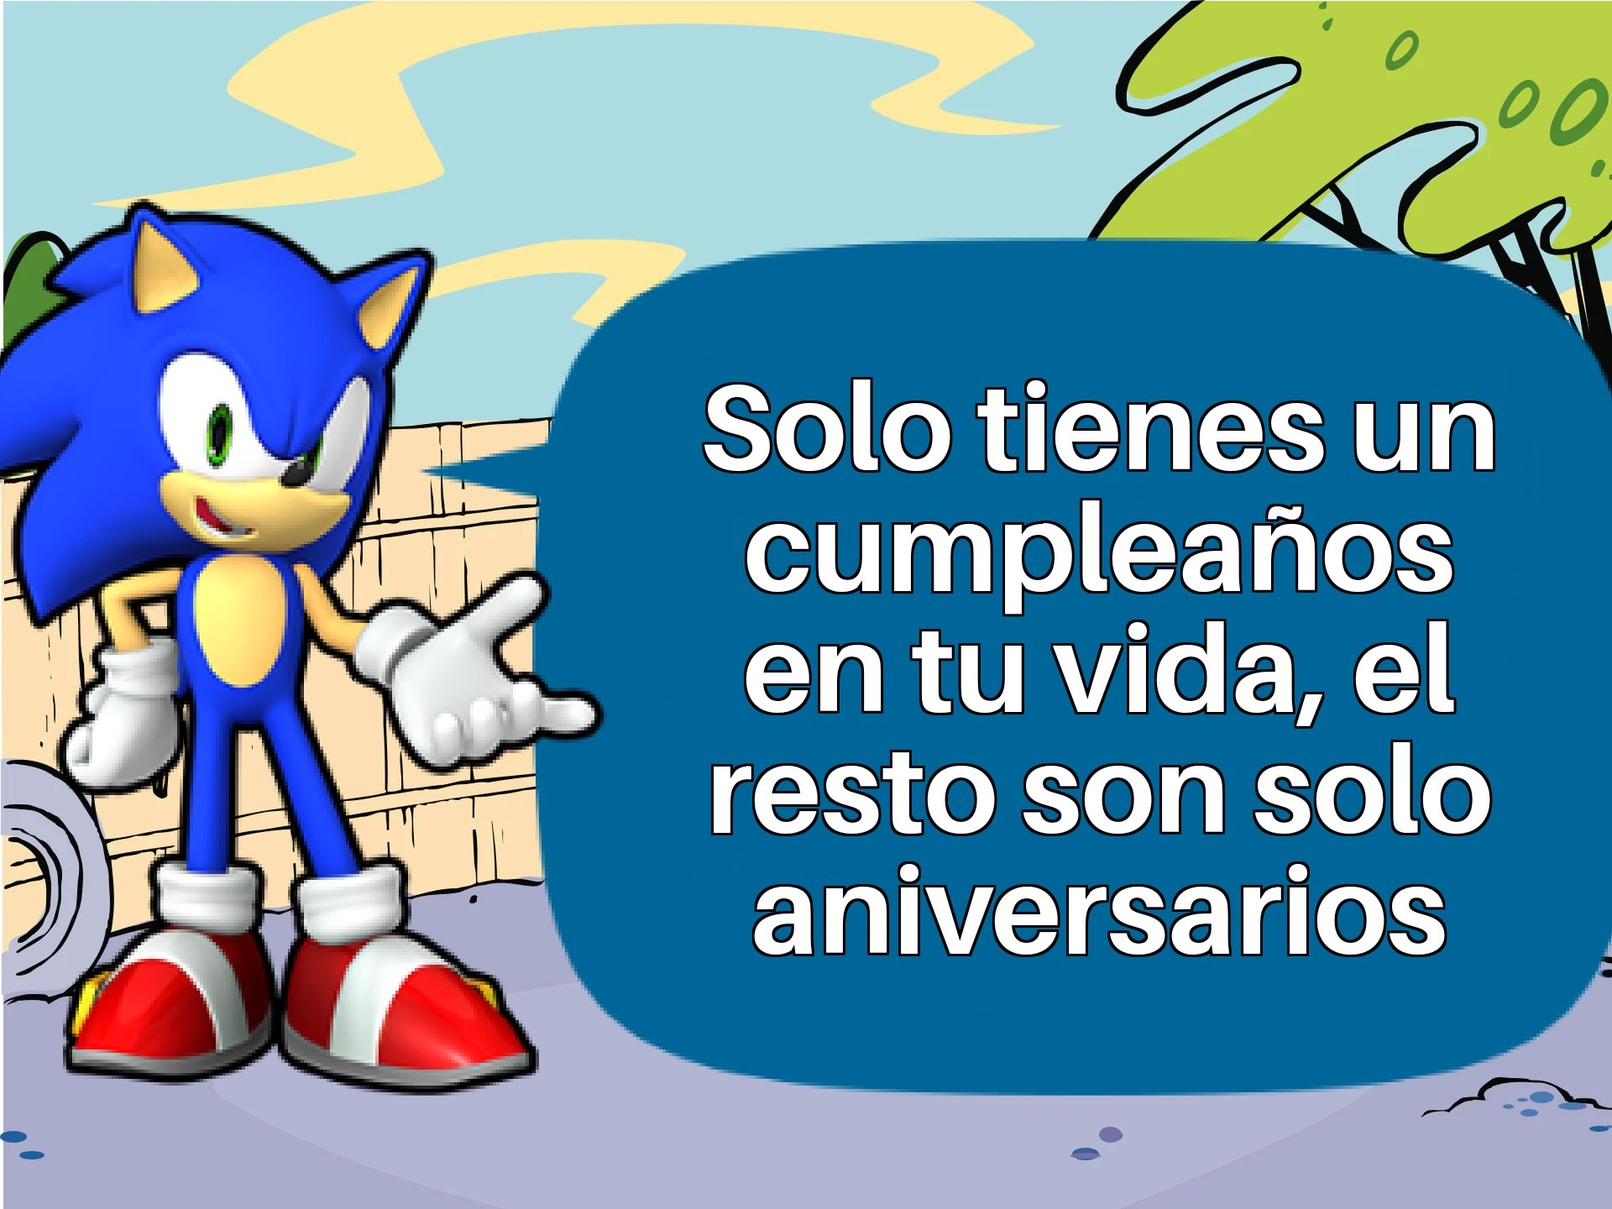 Sonic dice - meme